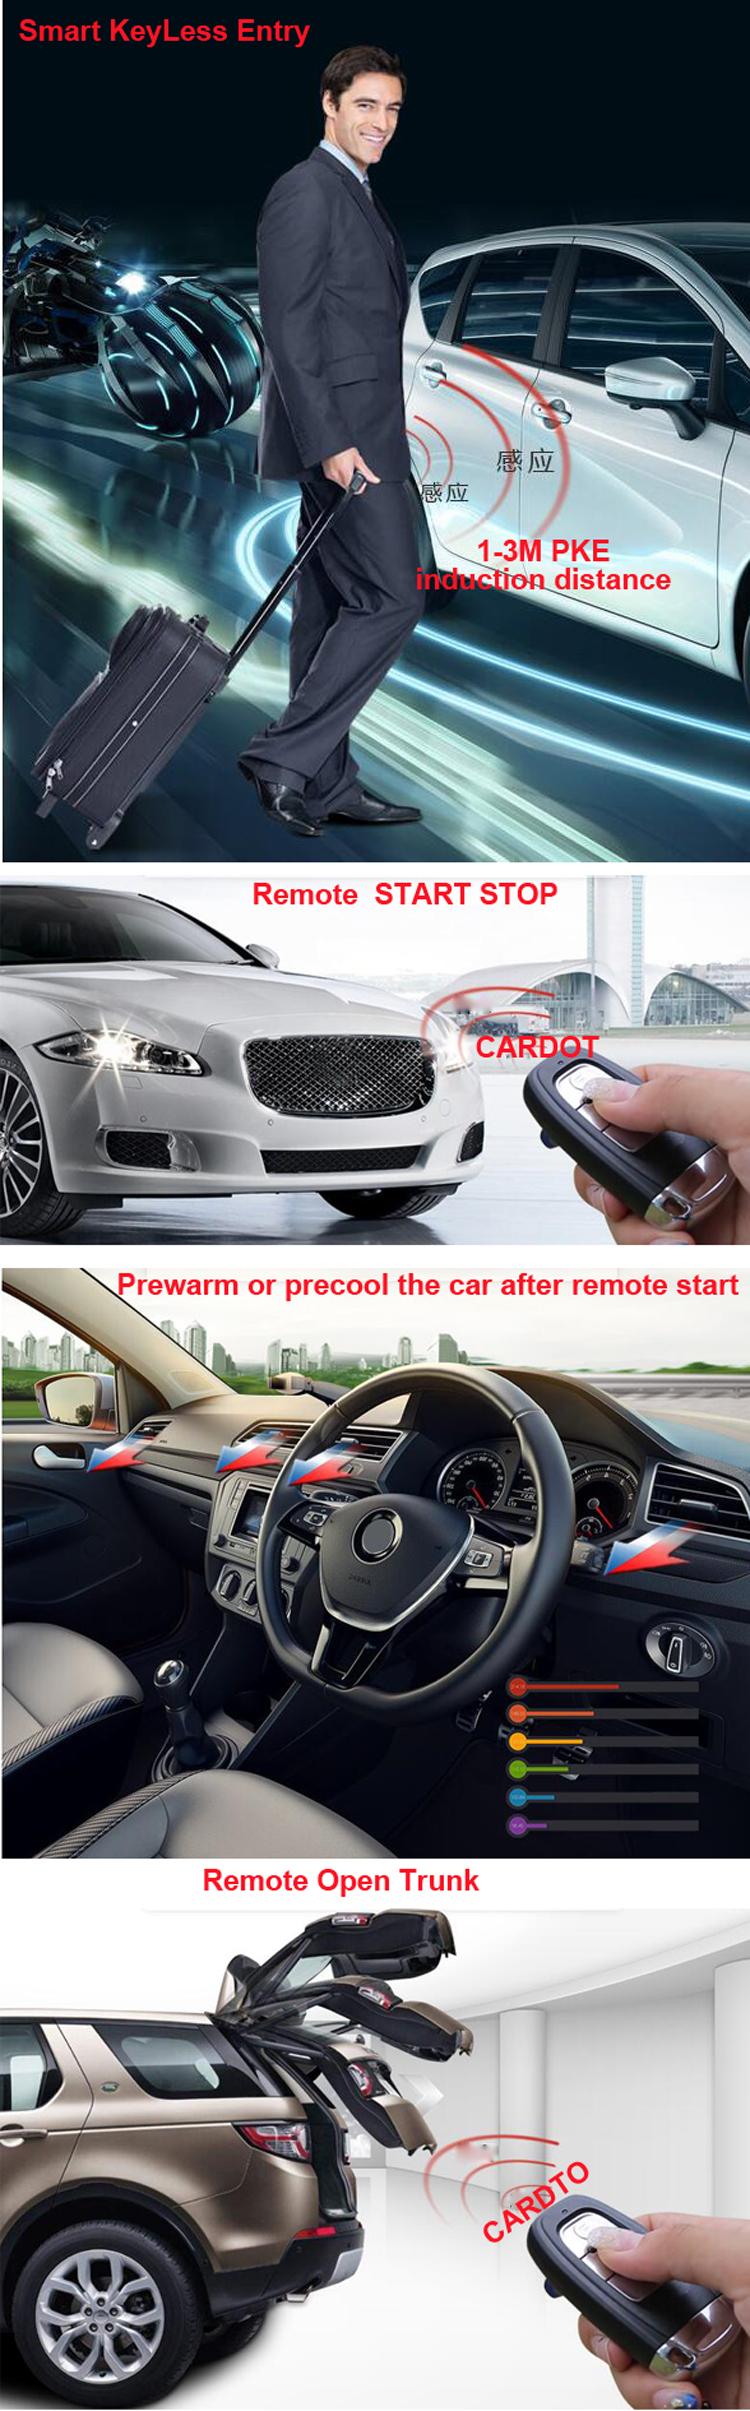 smart car alarm1 .jpg